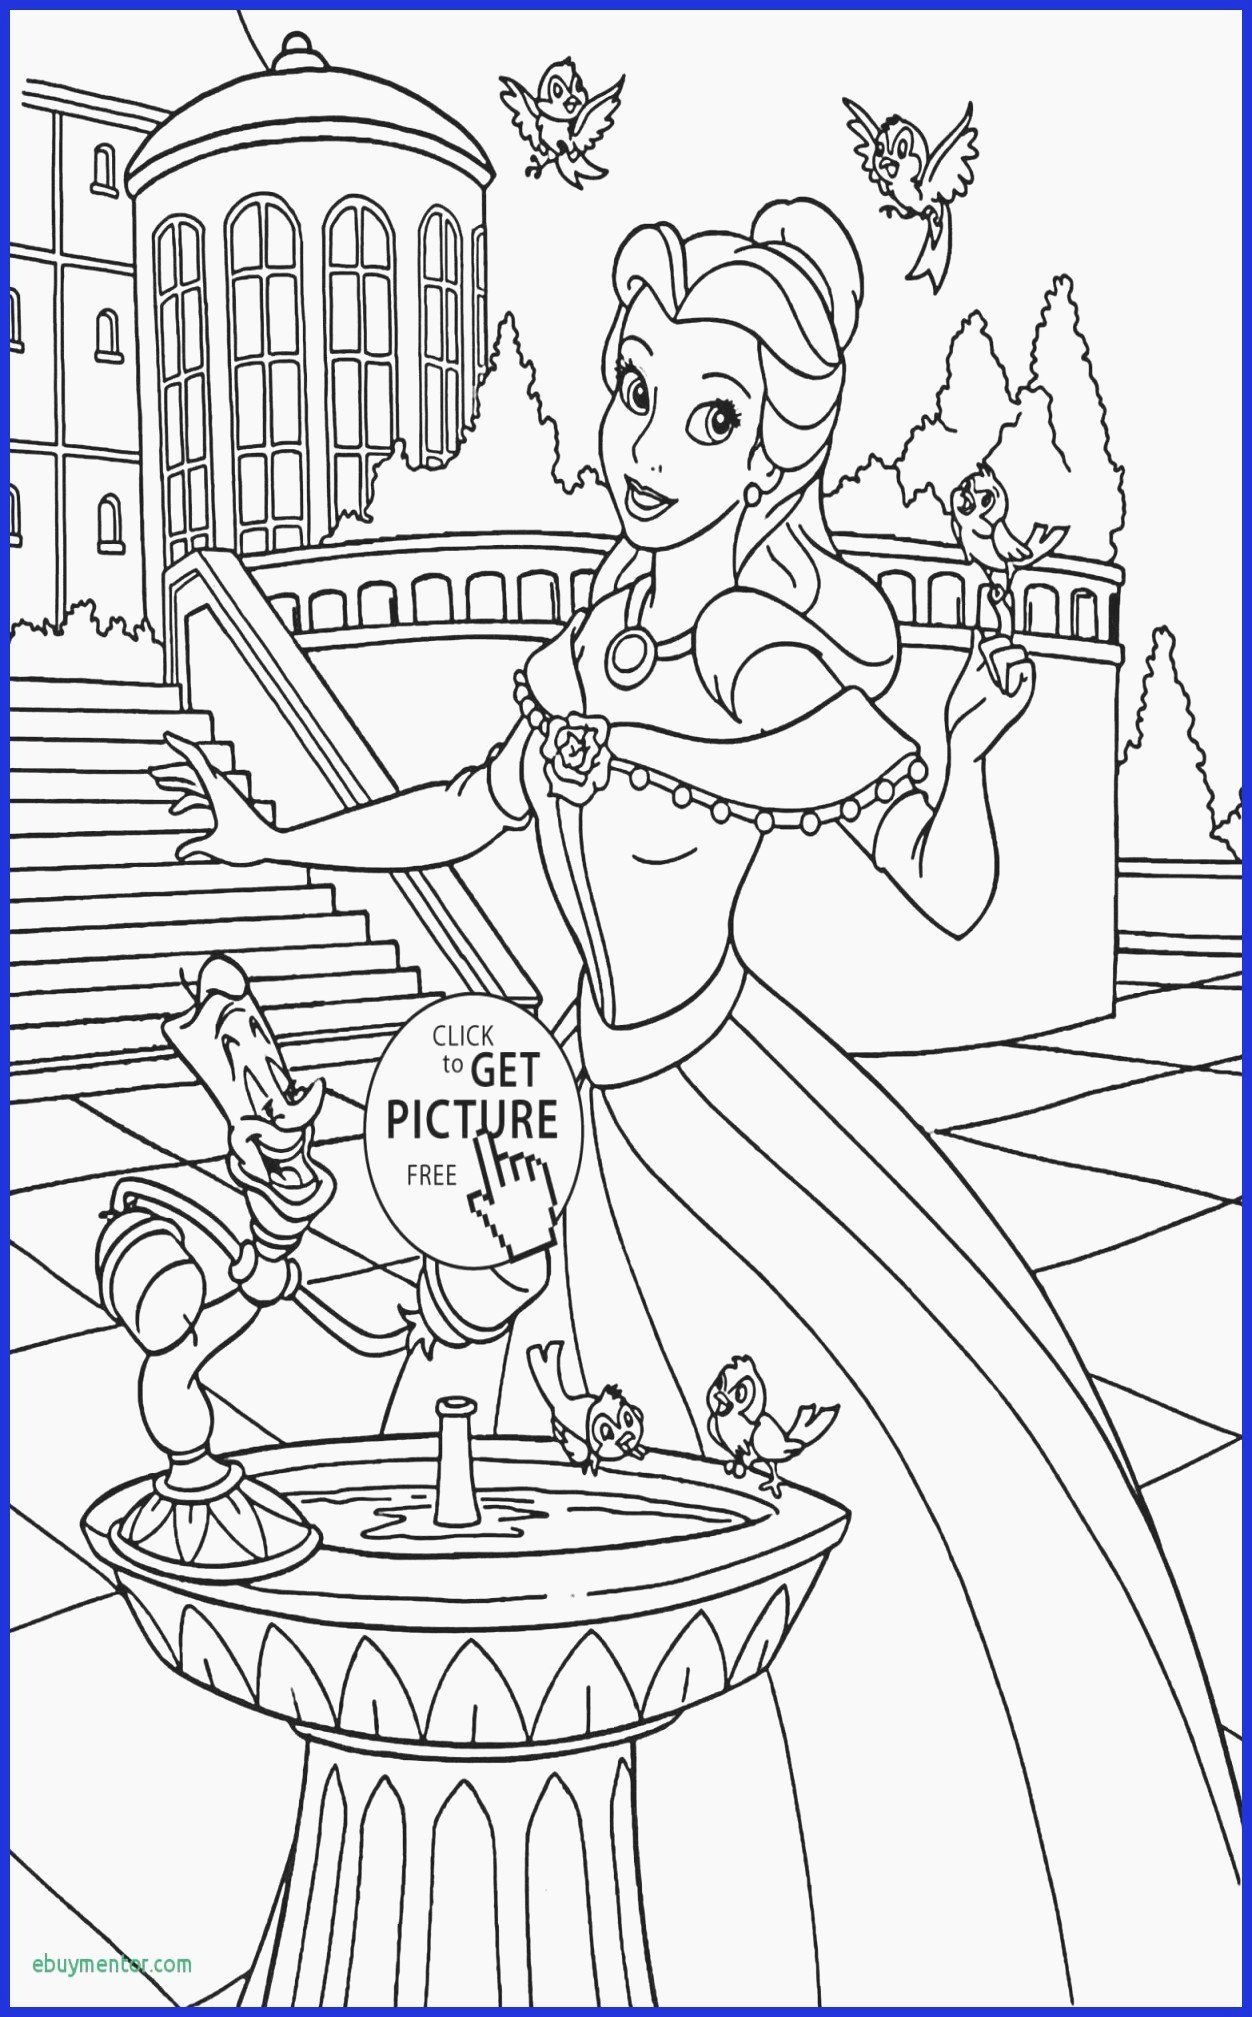 Princess Coloring Games Online Beautiful Disney Princesses Coloring Pages Awesome Fresh Disney Buku Mewarnai Warna Disney